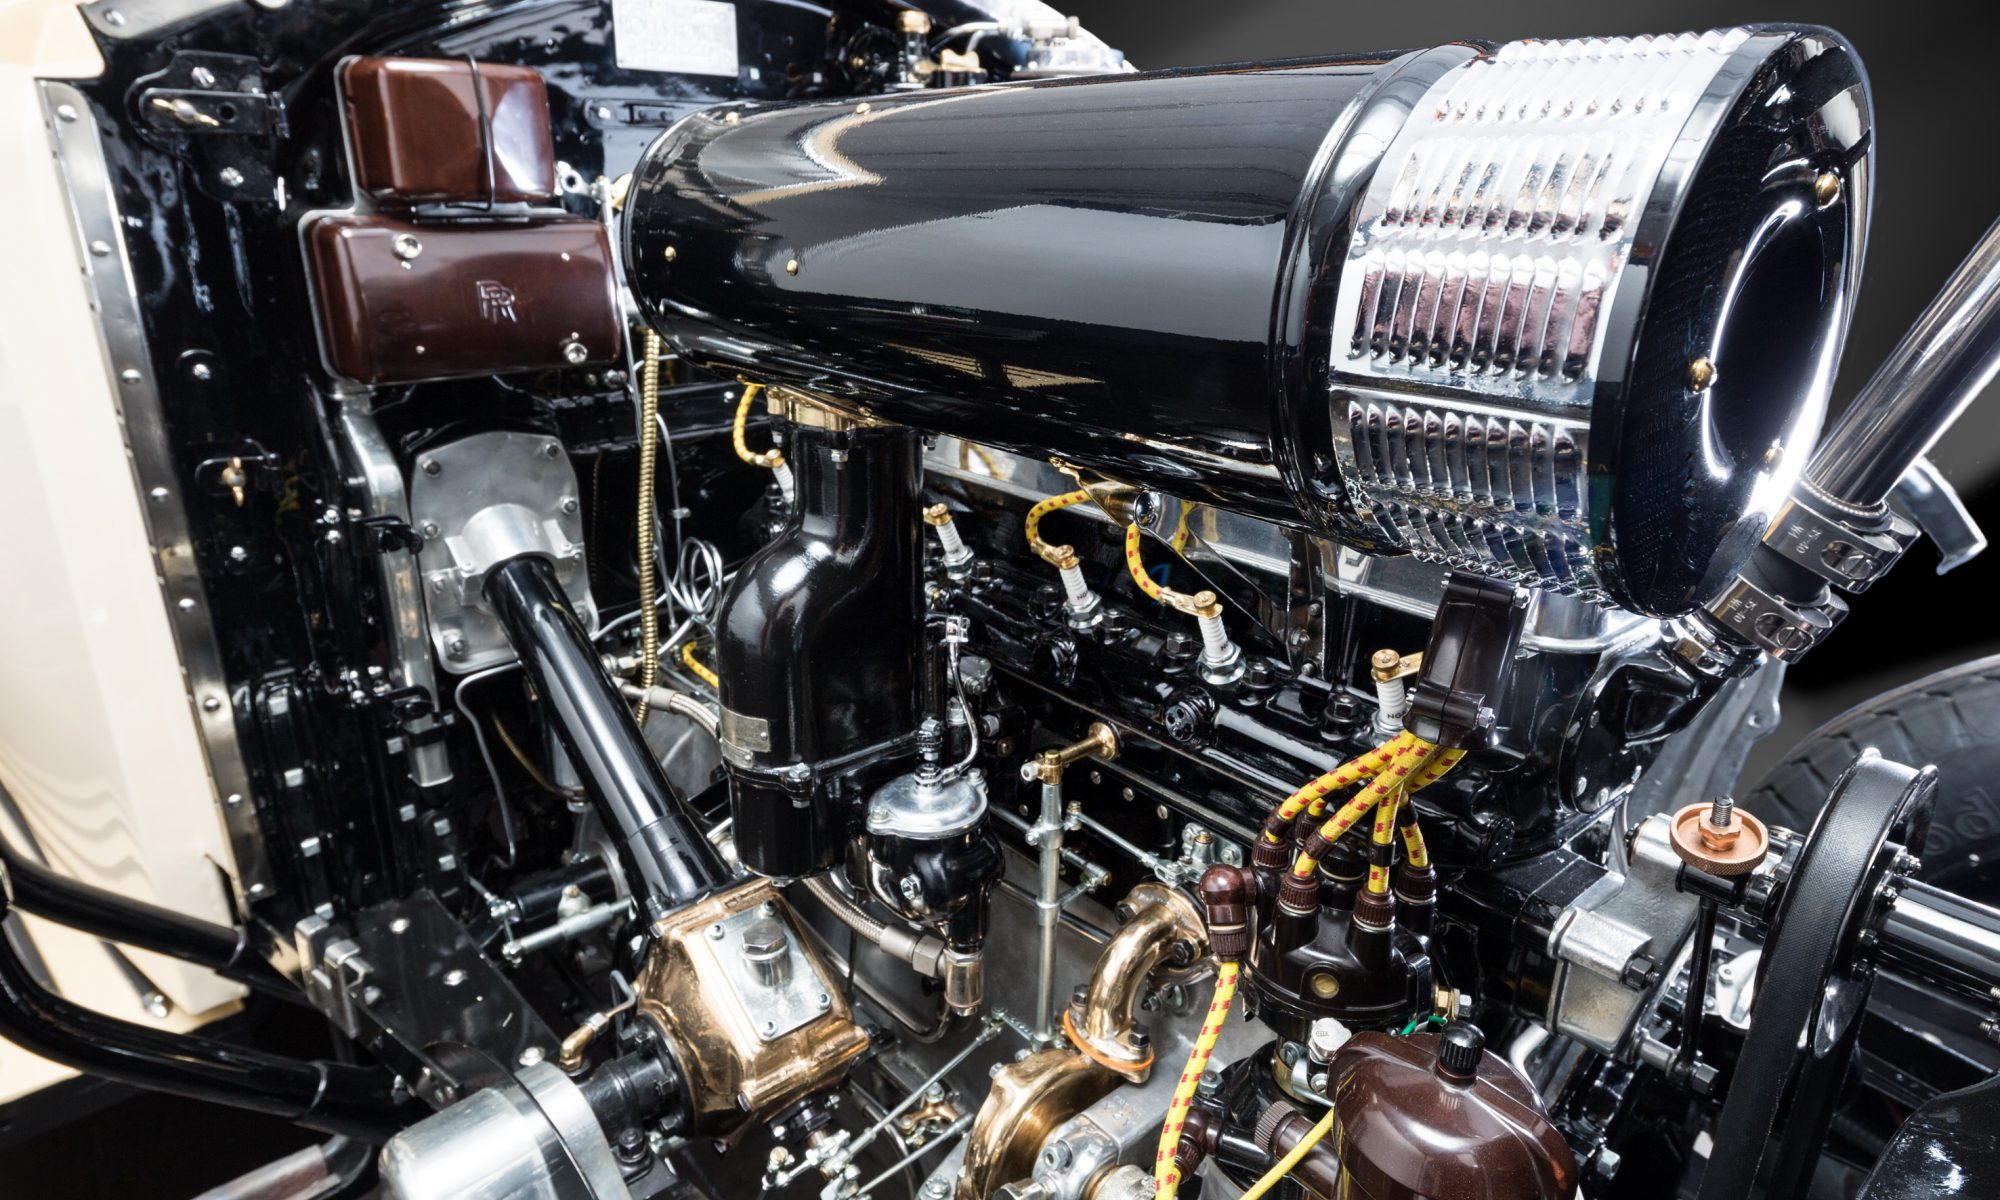 STIMAC Karosserietechnik Werkstatt Innenansicht Rolls Royce Motor